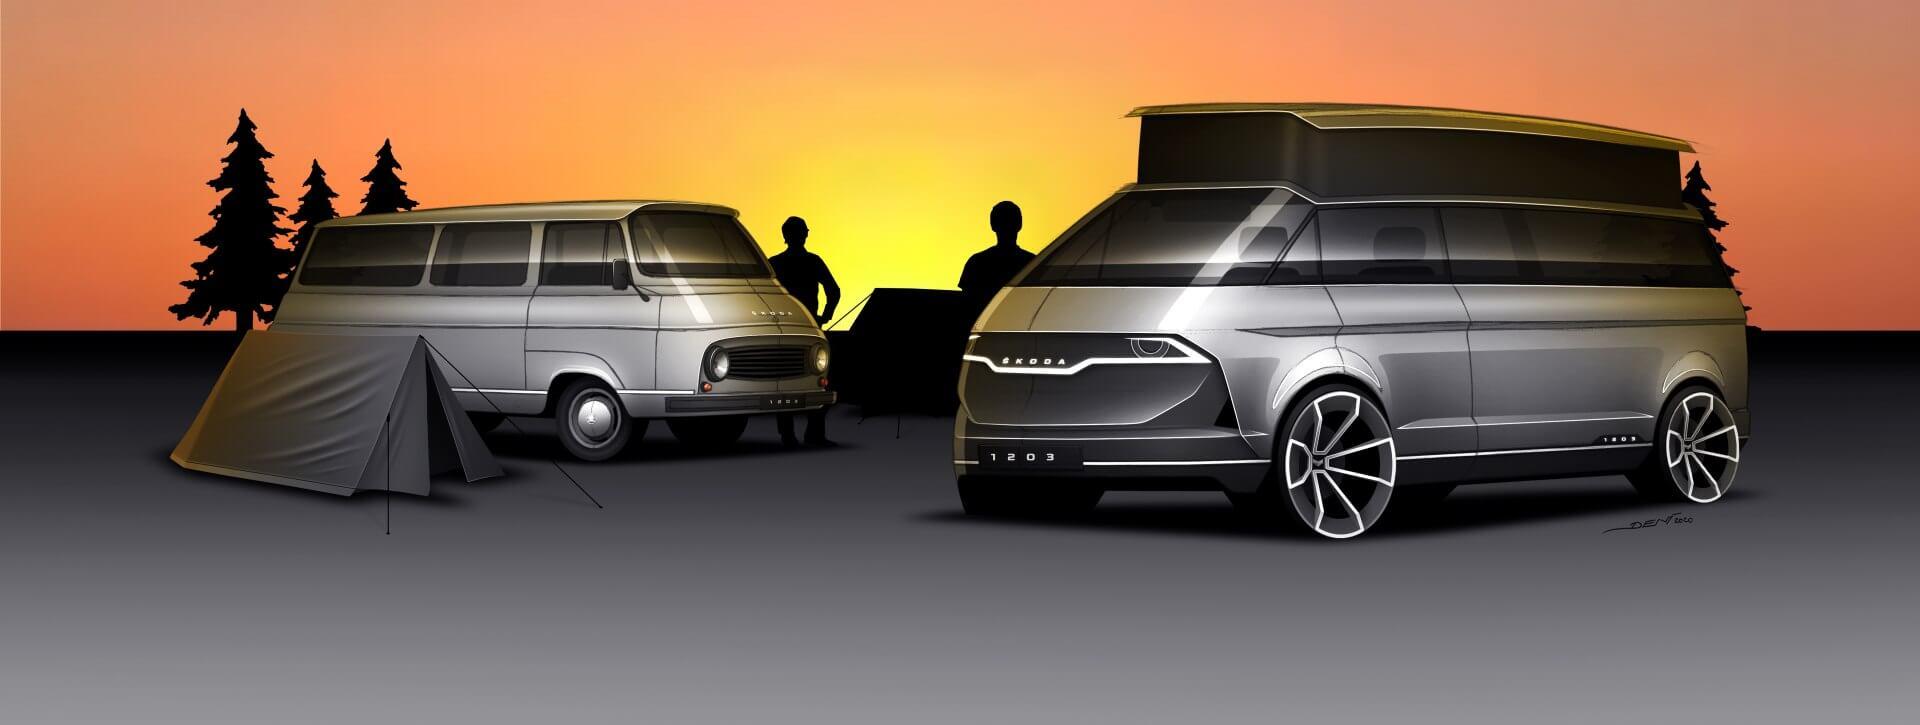 Skoda представила современный концепт ретро-фургона 1203